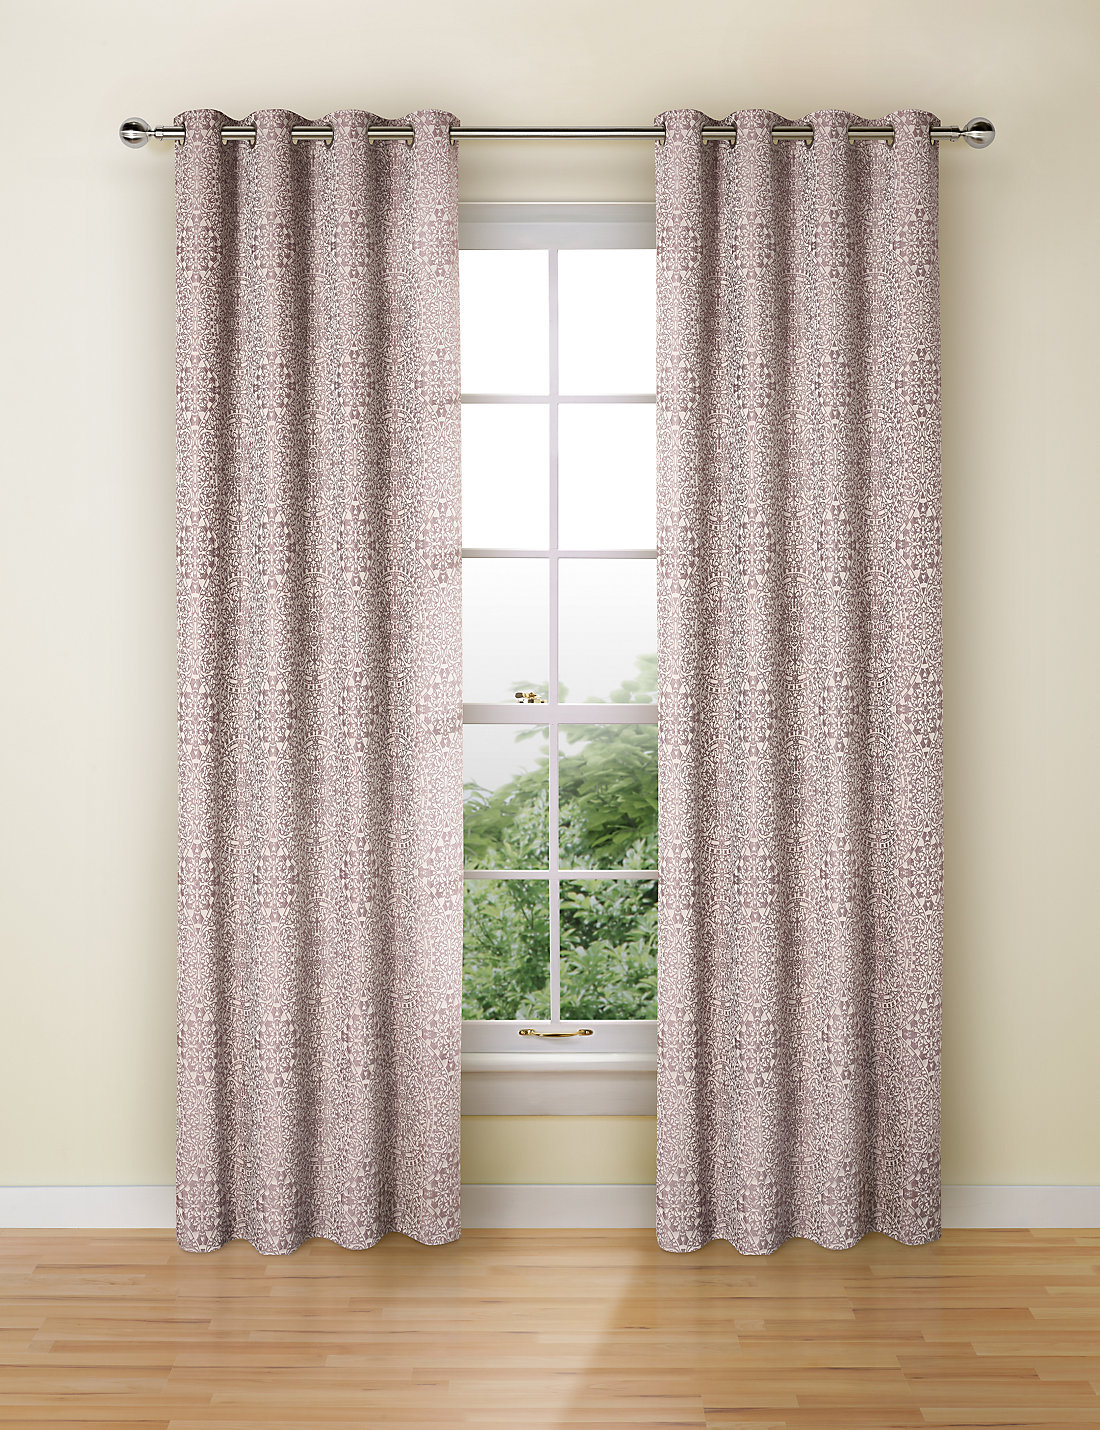 Chenille jacquard curtains